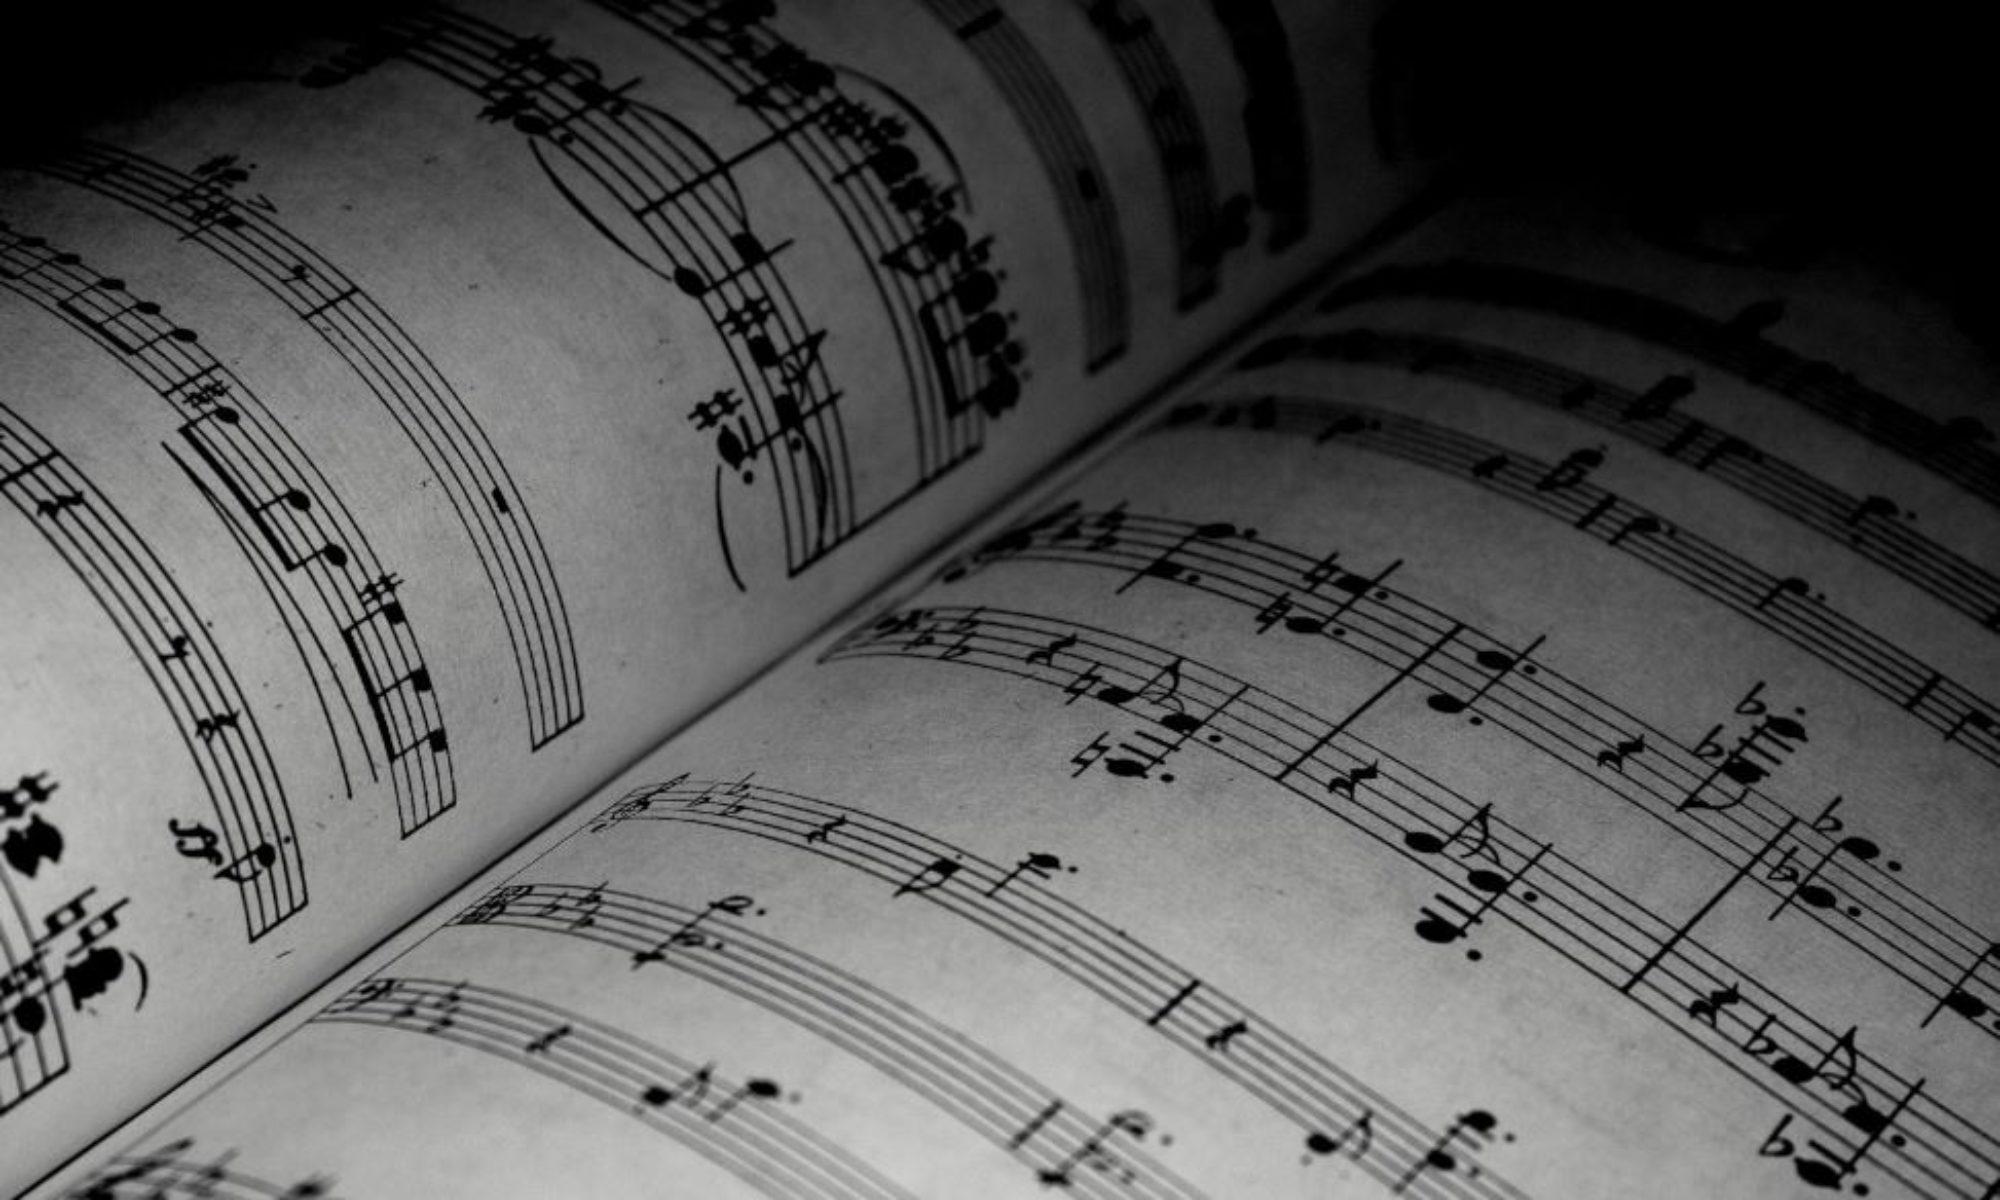 Blog musique, instruments, apprentissage